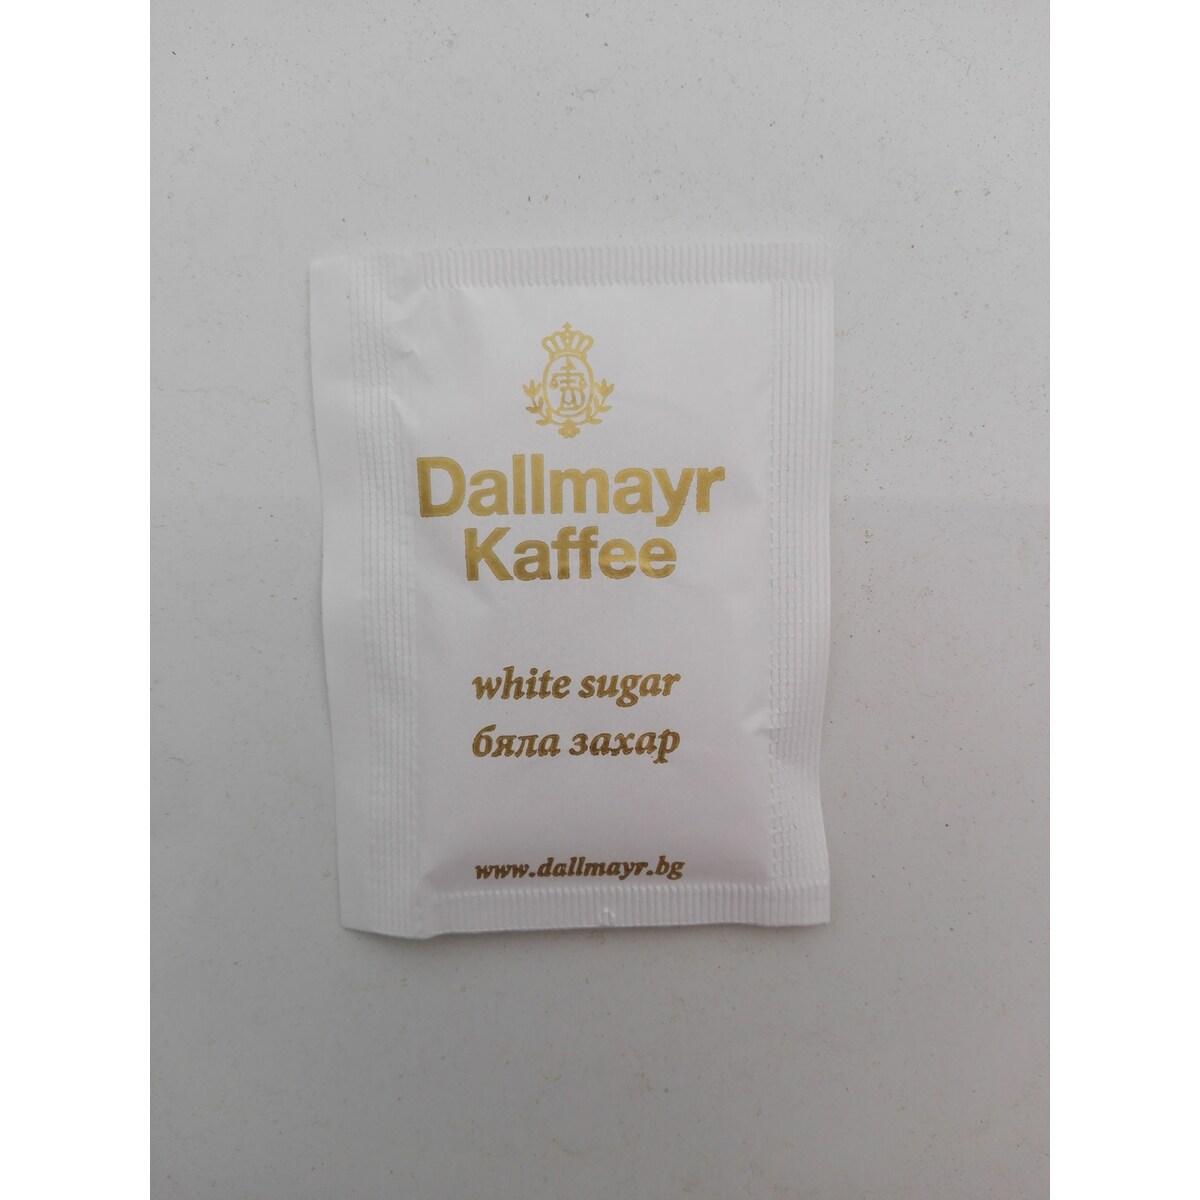 Dallmayr бяла захар в пакетче 4гр, 1000бр